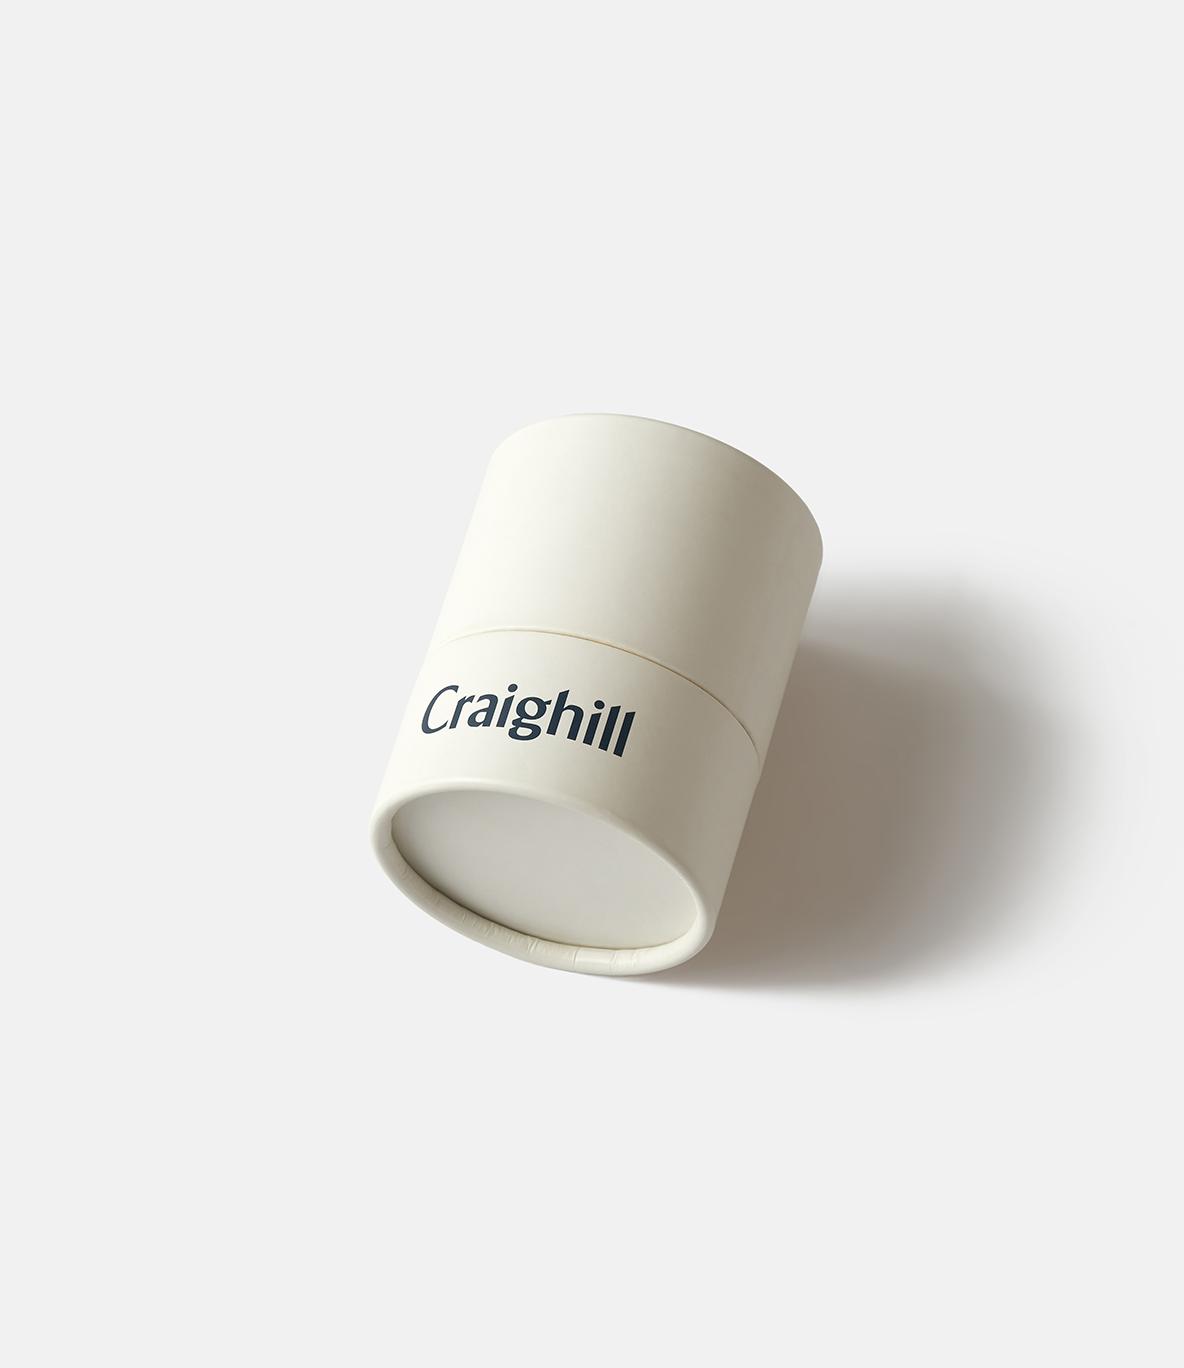 Craighill Trophy — открывалка из латуни